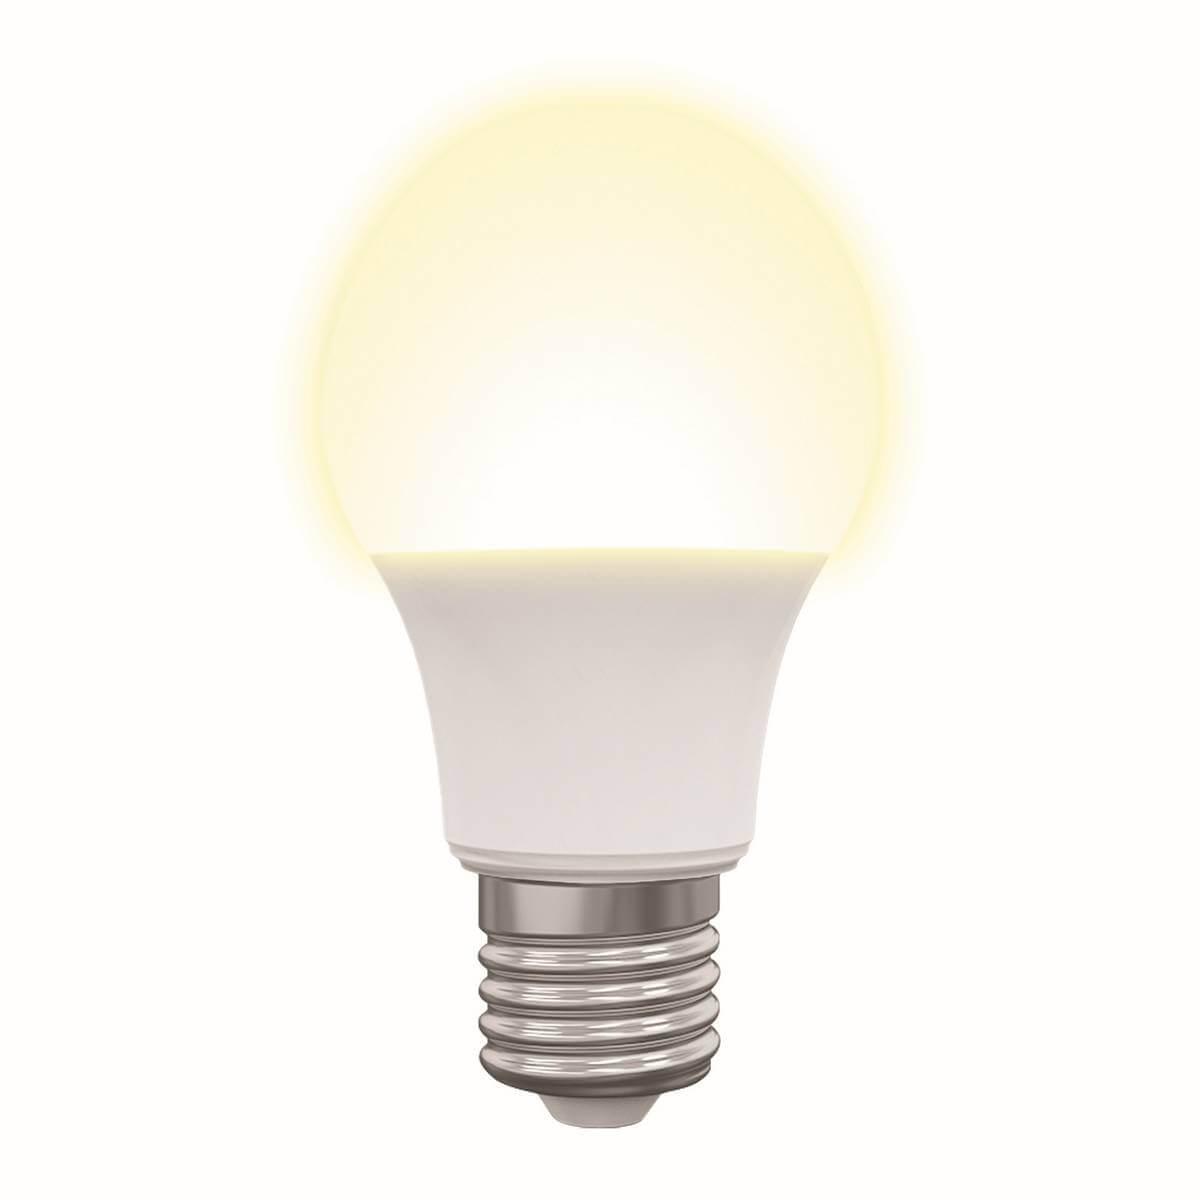 Лампочка Volpe LED-A60-7W/3000K/E27/FR/NR Norma эра f led a60 e27 7w 220v 2700k